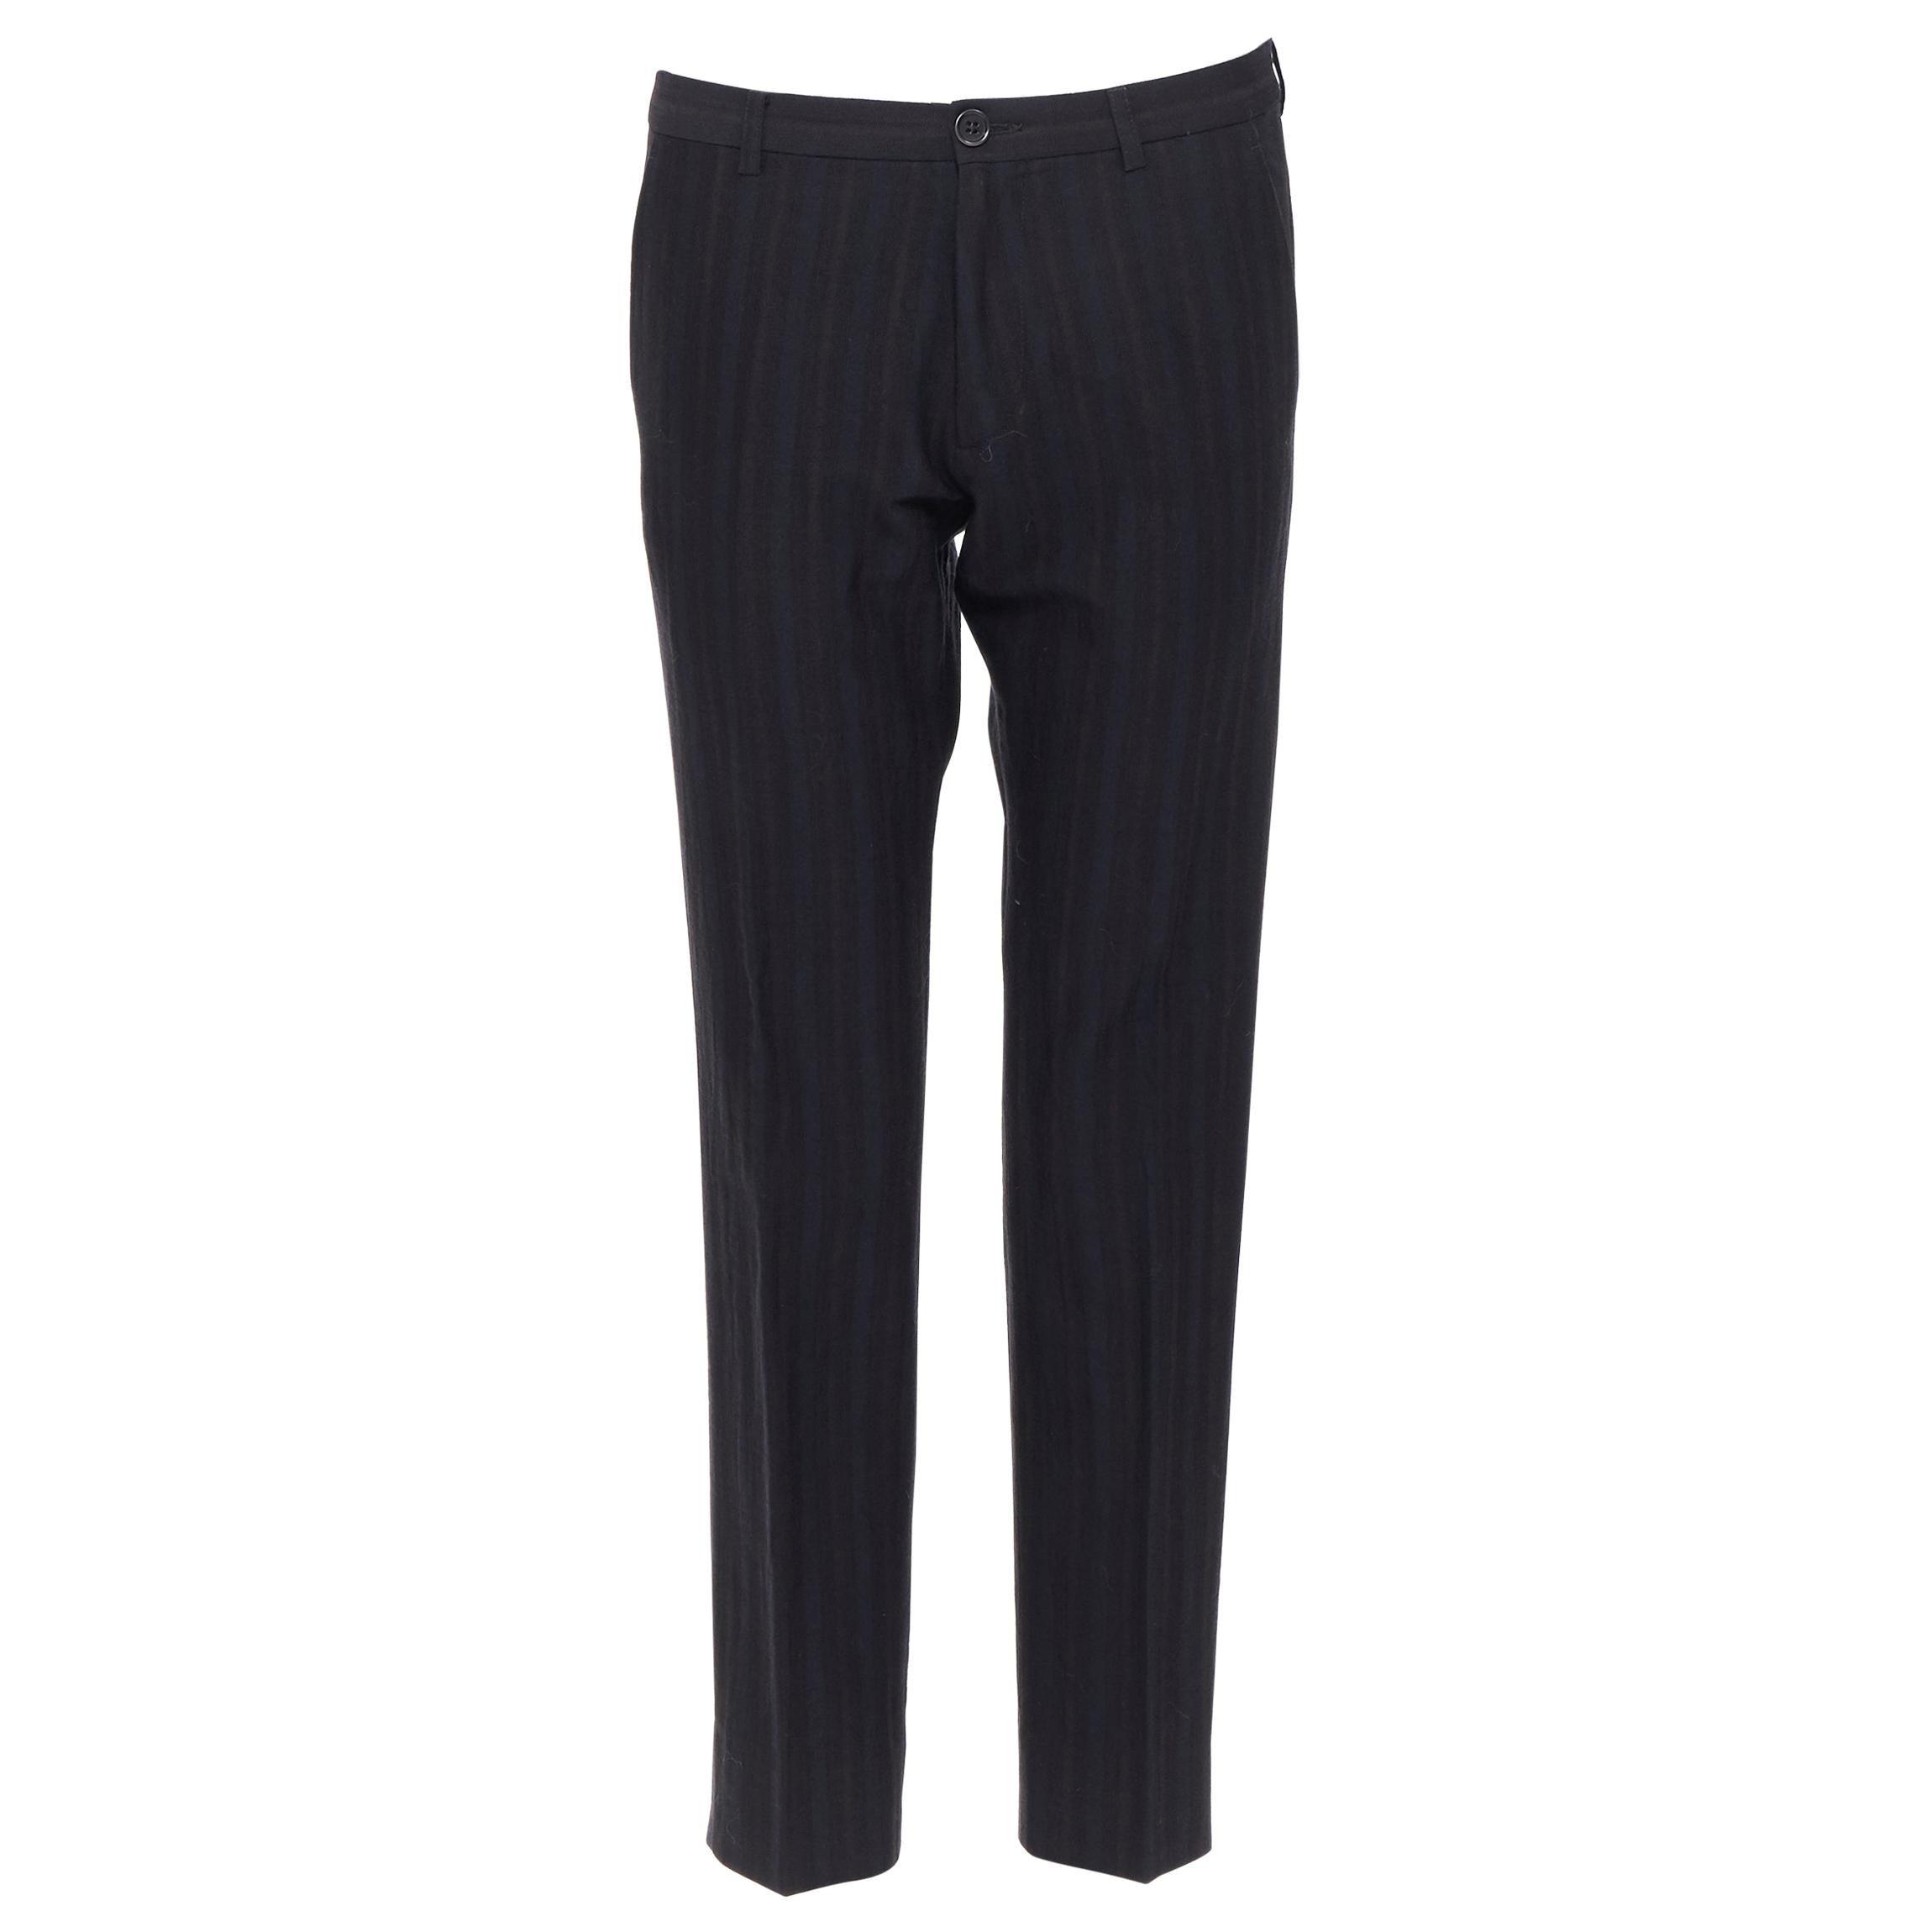 LANVIN ALBER ELBAZ mohair wool black satin side trimmed tuxedo trousers FR44